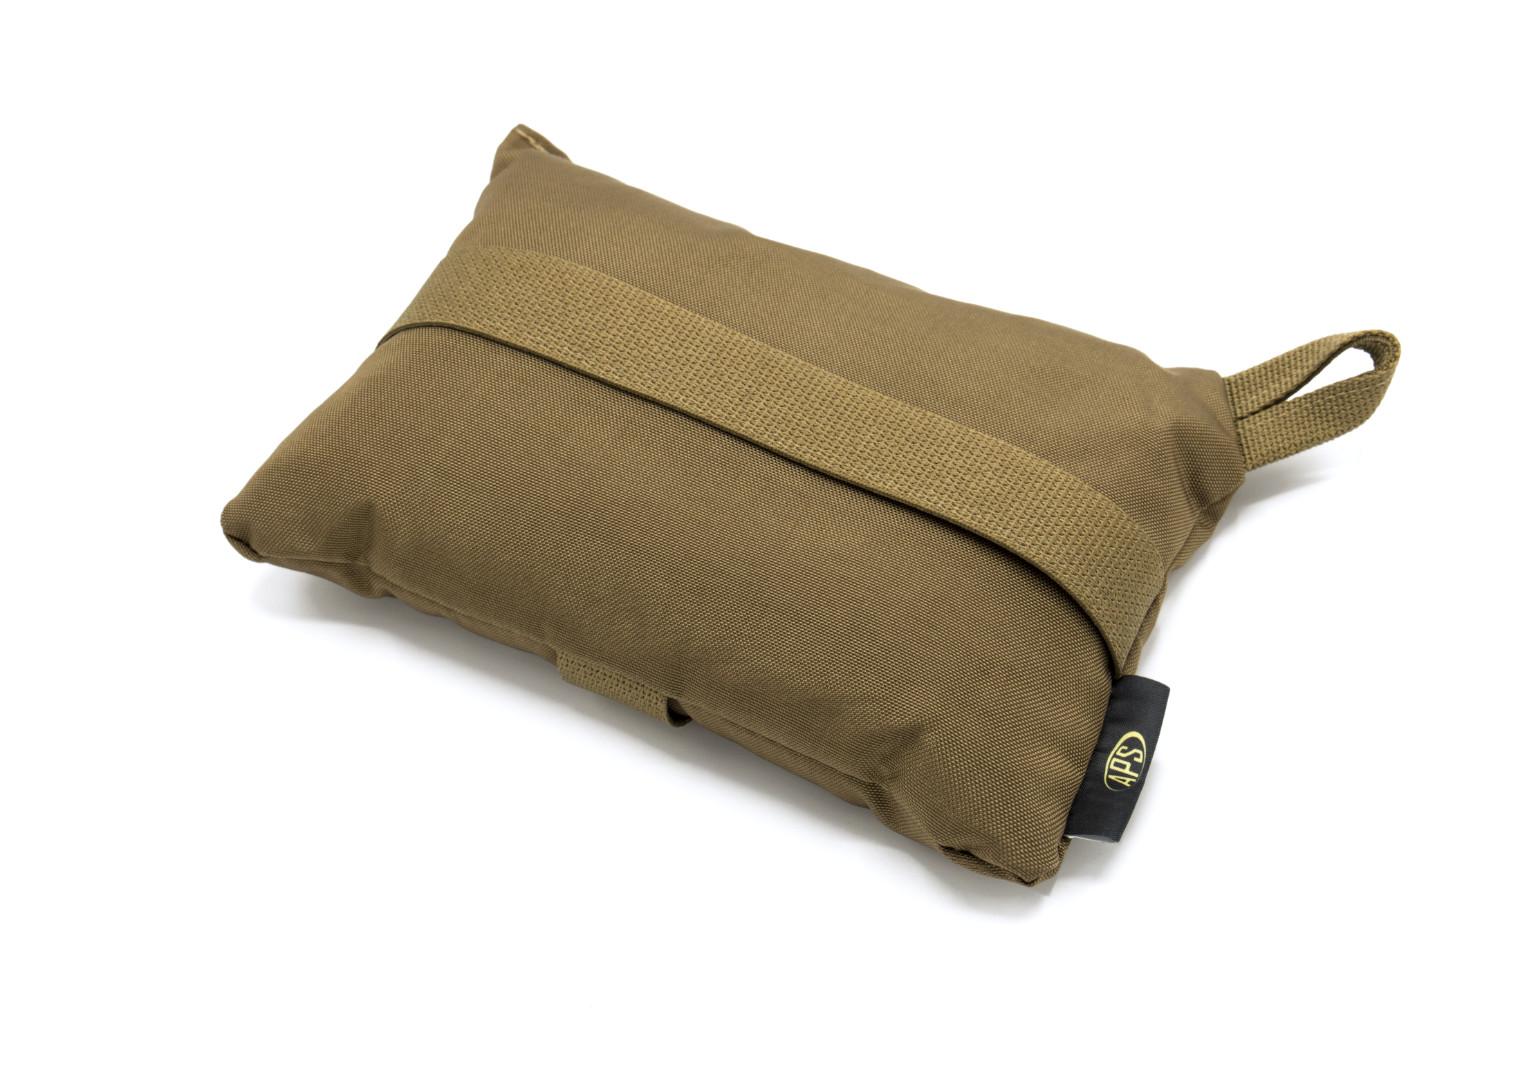 Подушка под приклад APS стандартная легкая, койот